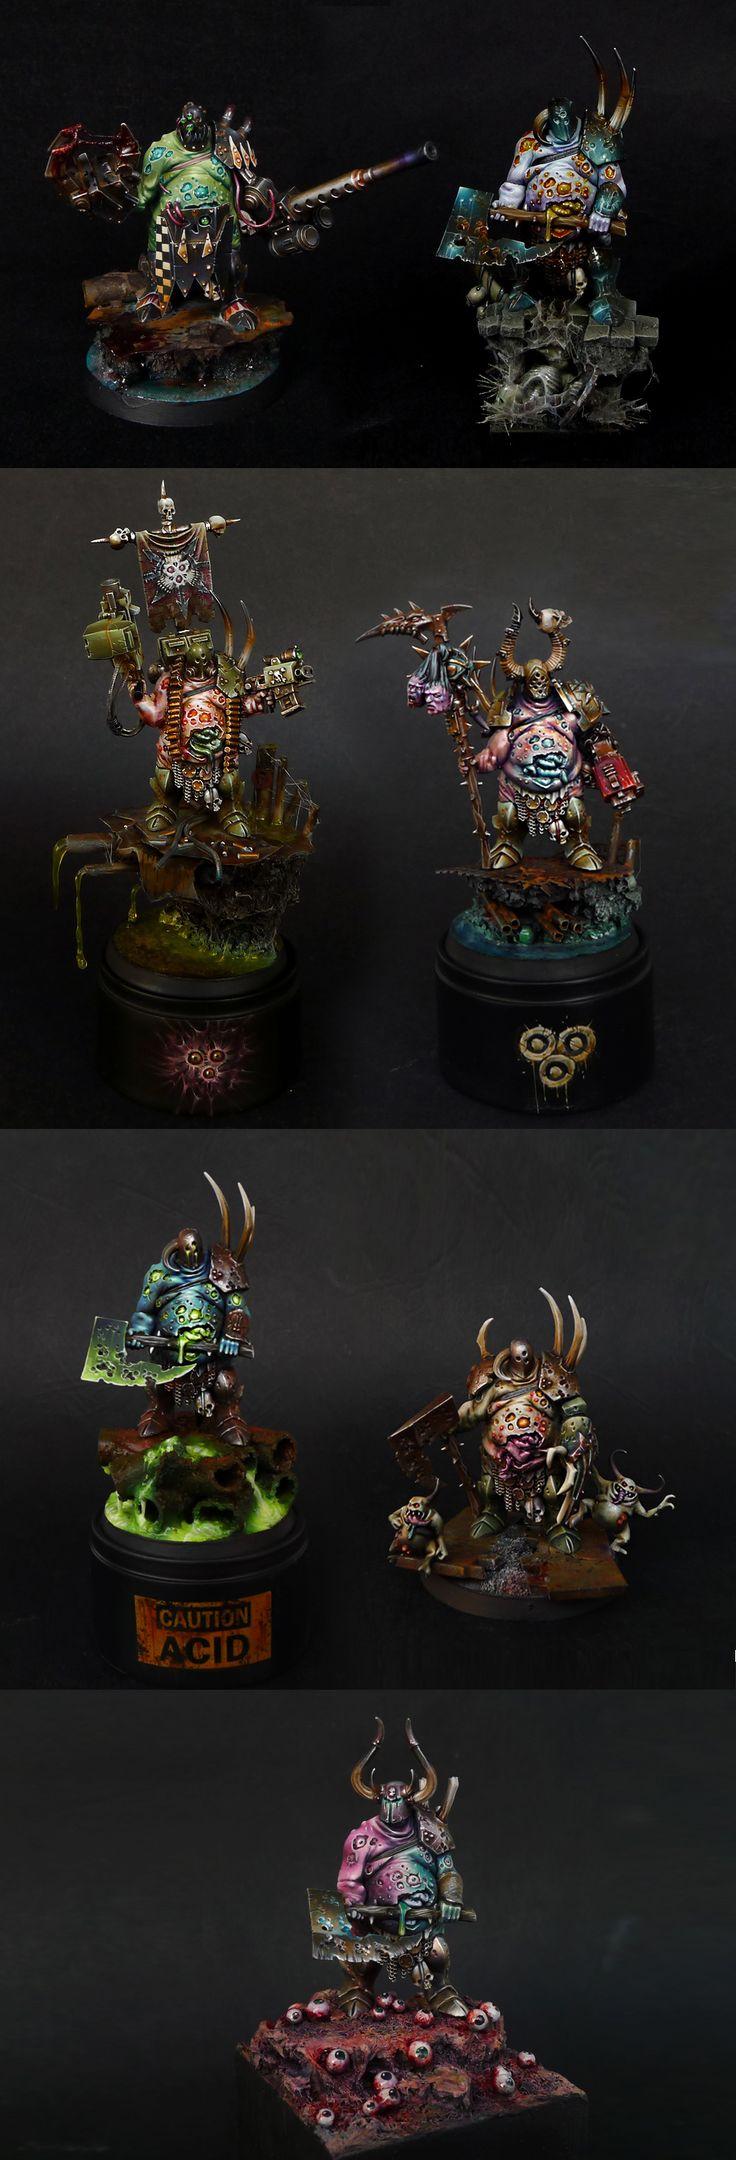 Chaos Nurgle Lords Conversions Manufacturer: Games Workshop by fantasygames.com.pl lukassz.grzyb@gmail.com